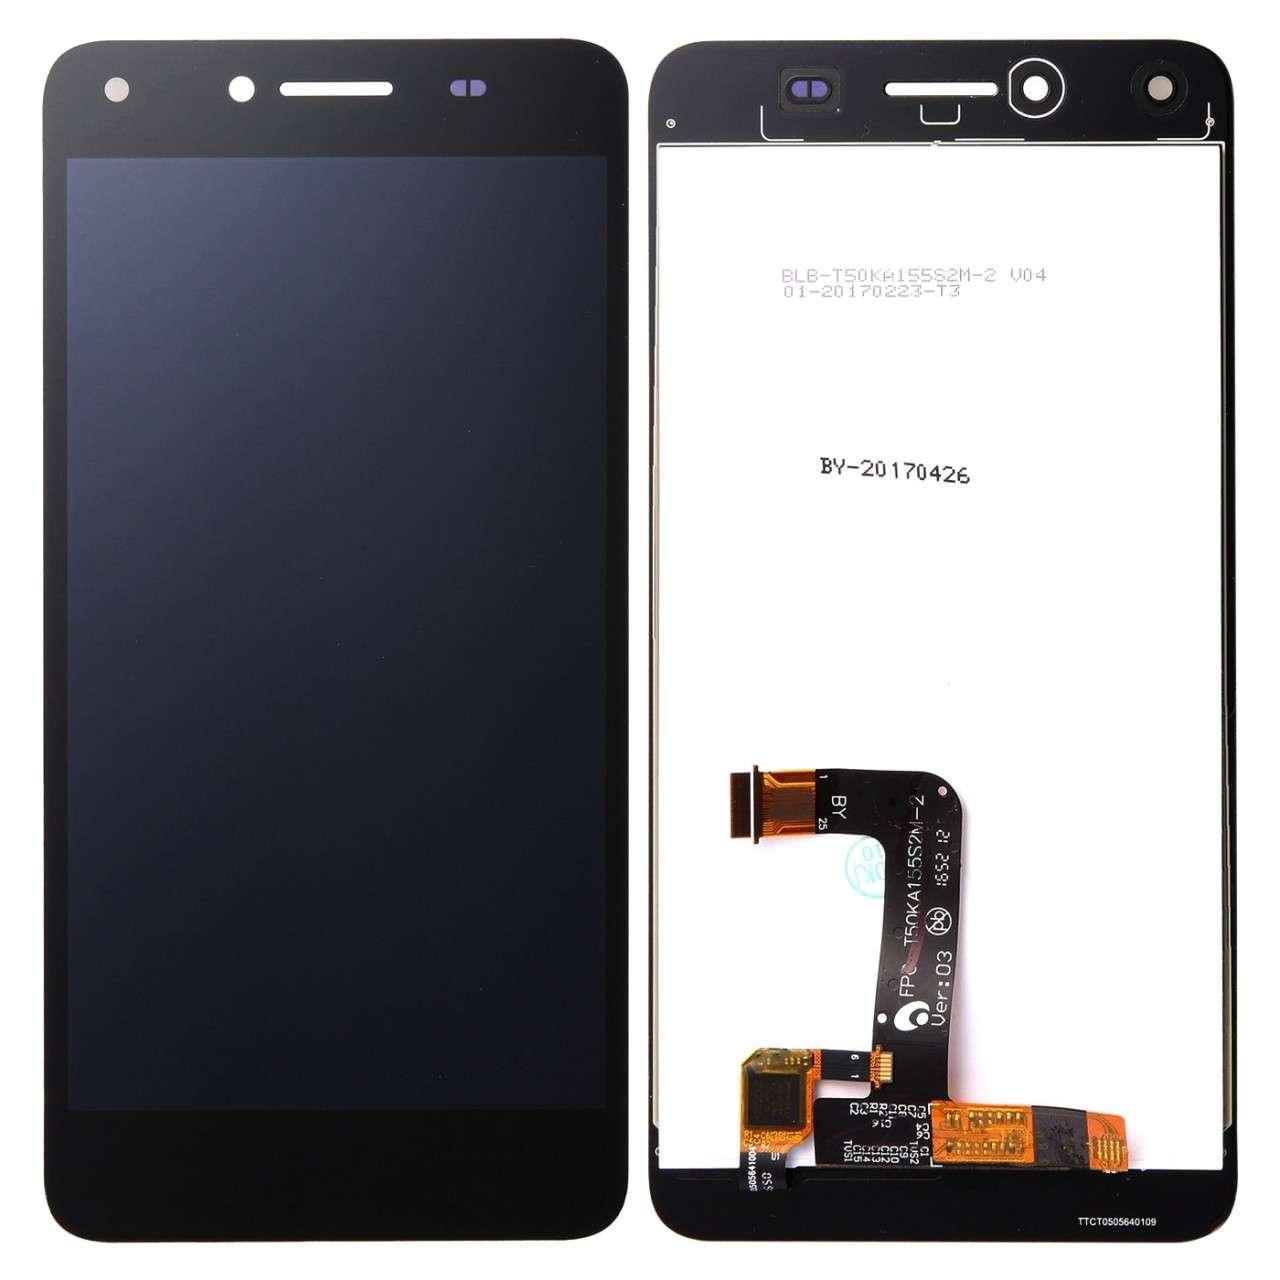 Display Huawei Honor 5 Black Negru imagine powerlaptop.ro 2021